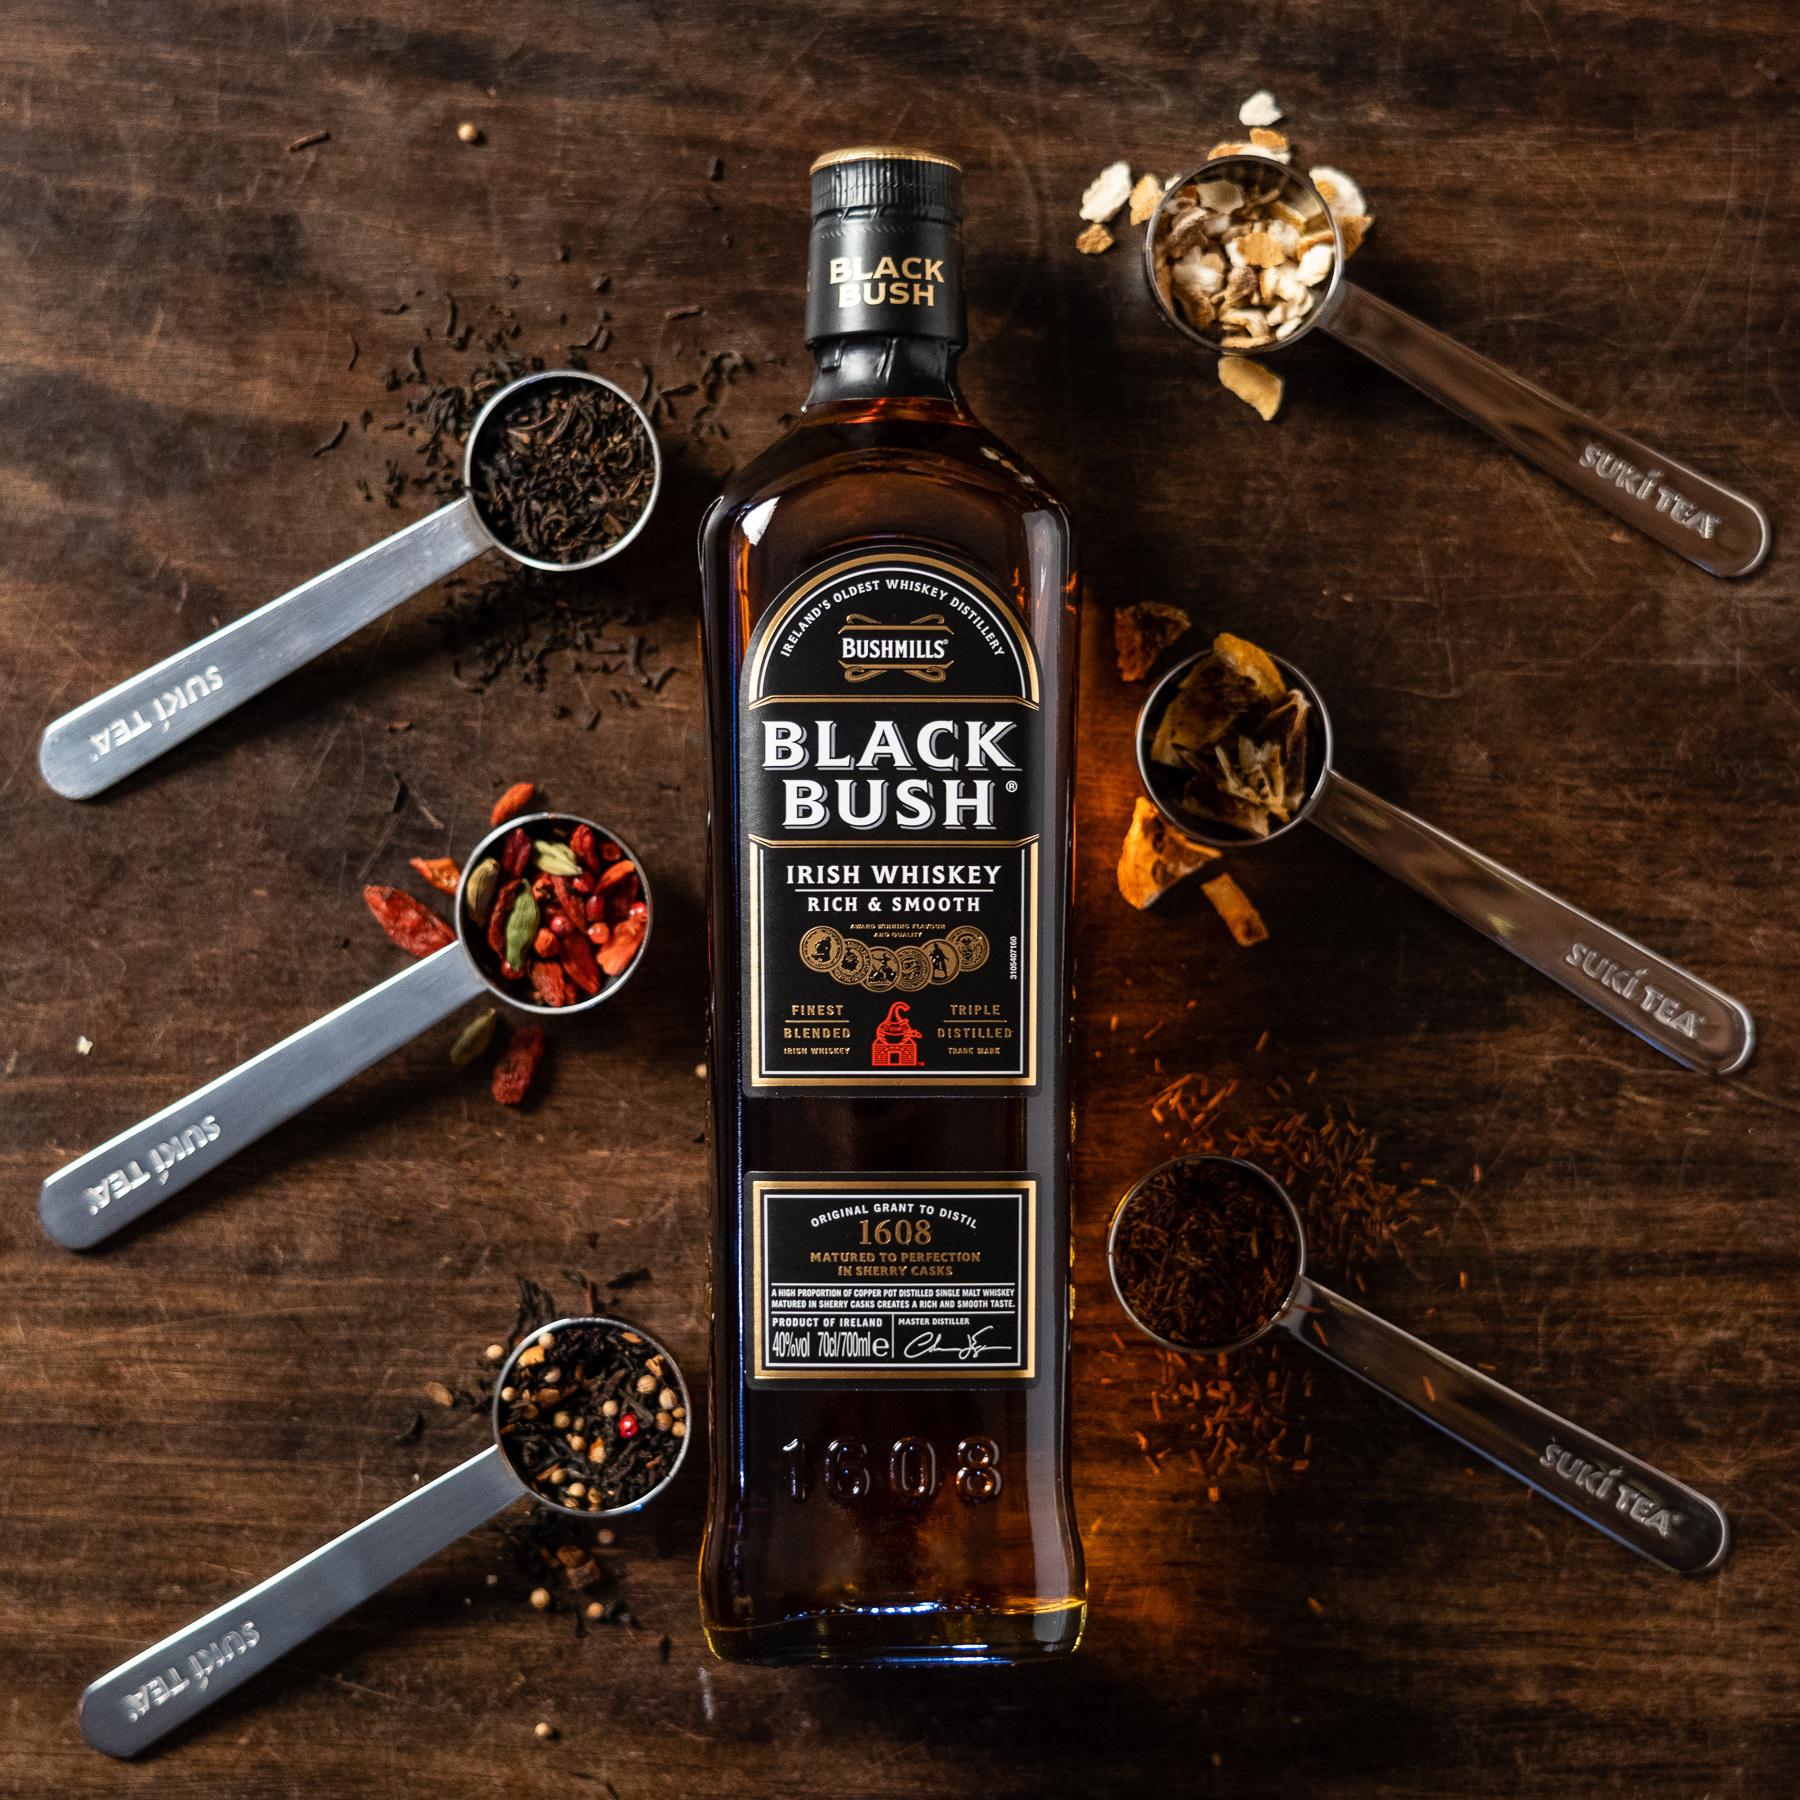 Bushmills Black Bush Suki Story